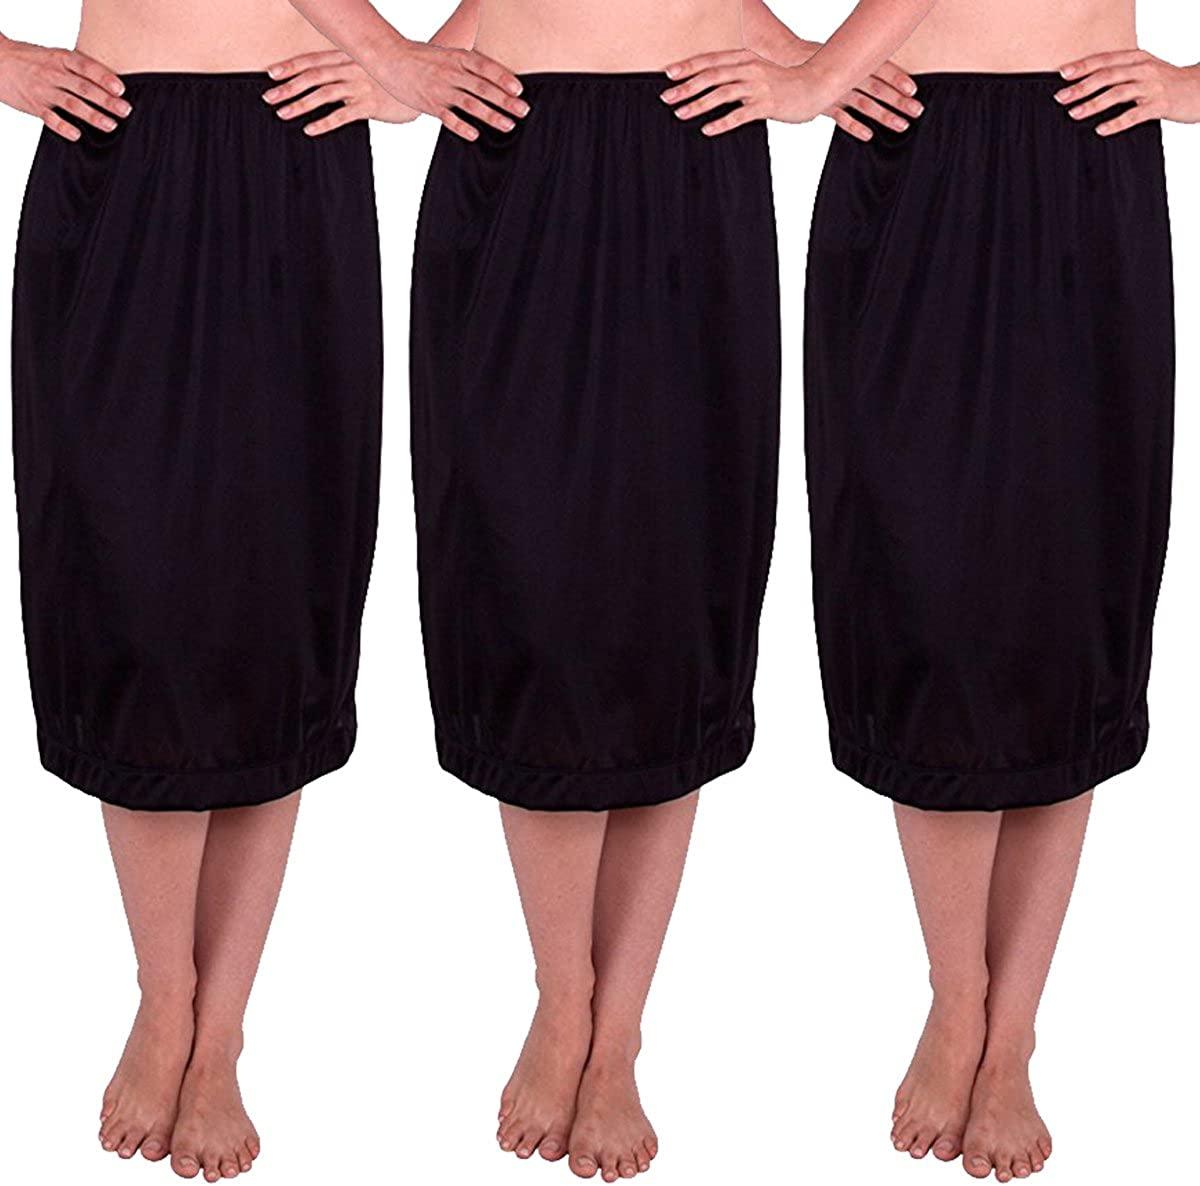 Under Moments Long Skirt (UM52029) Black, XL (Pack of 3)